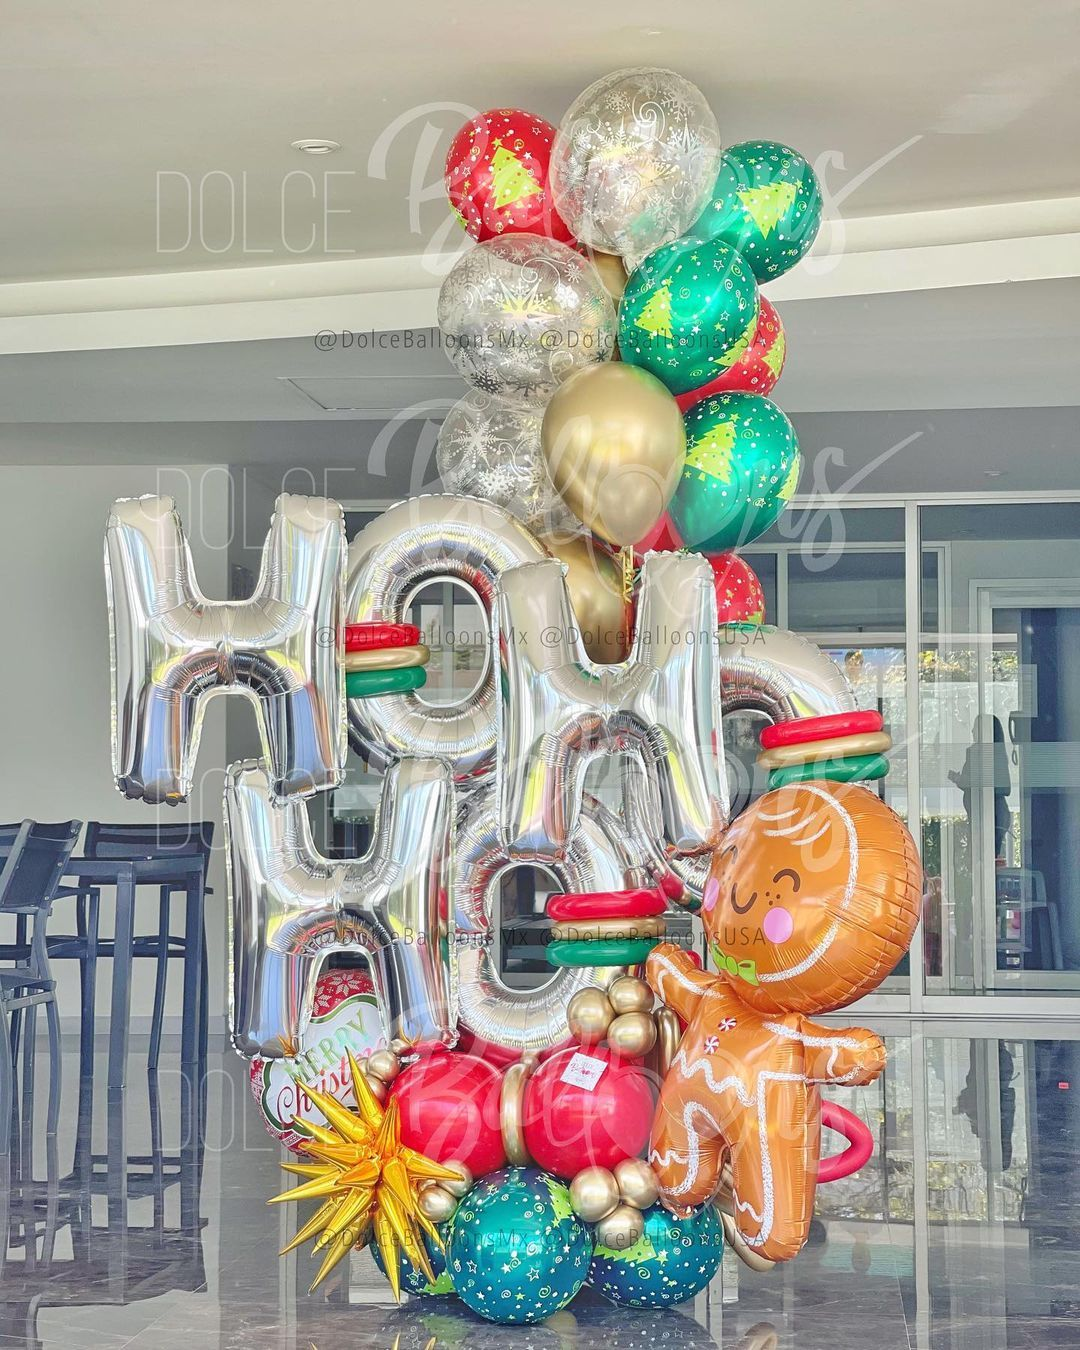 Slayin Since 89 Balloon Setl Slay Balloonsl Birthday Balloon Decorl Girl Birthdayl Slayl Hen Partyl Celebration Balloonl Slay All Day